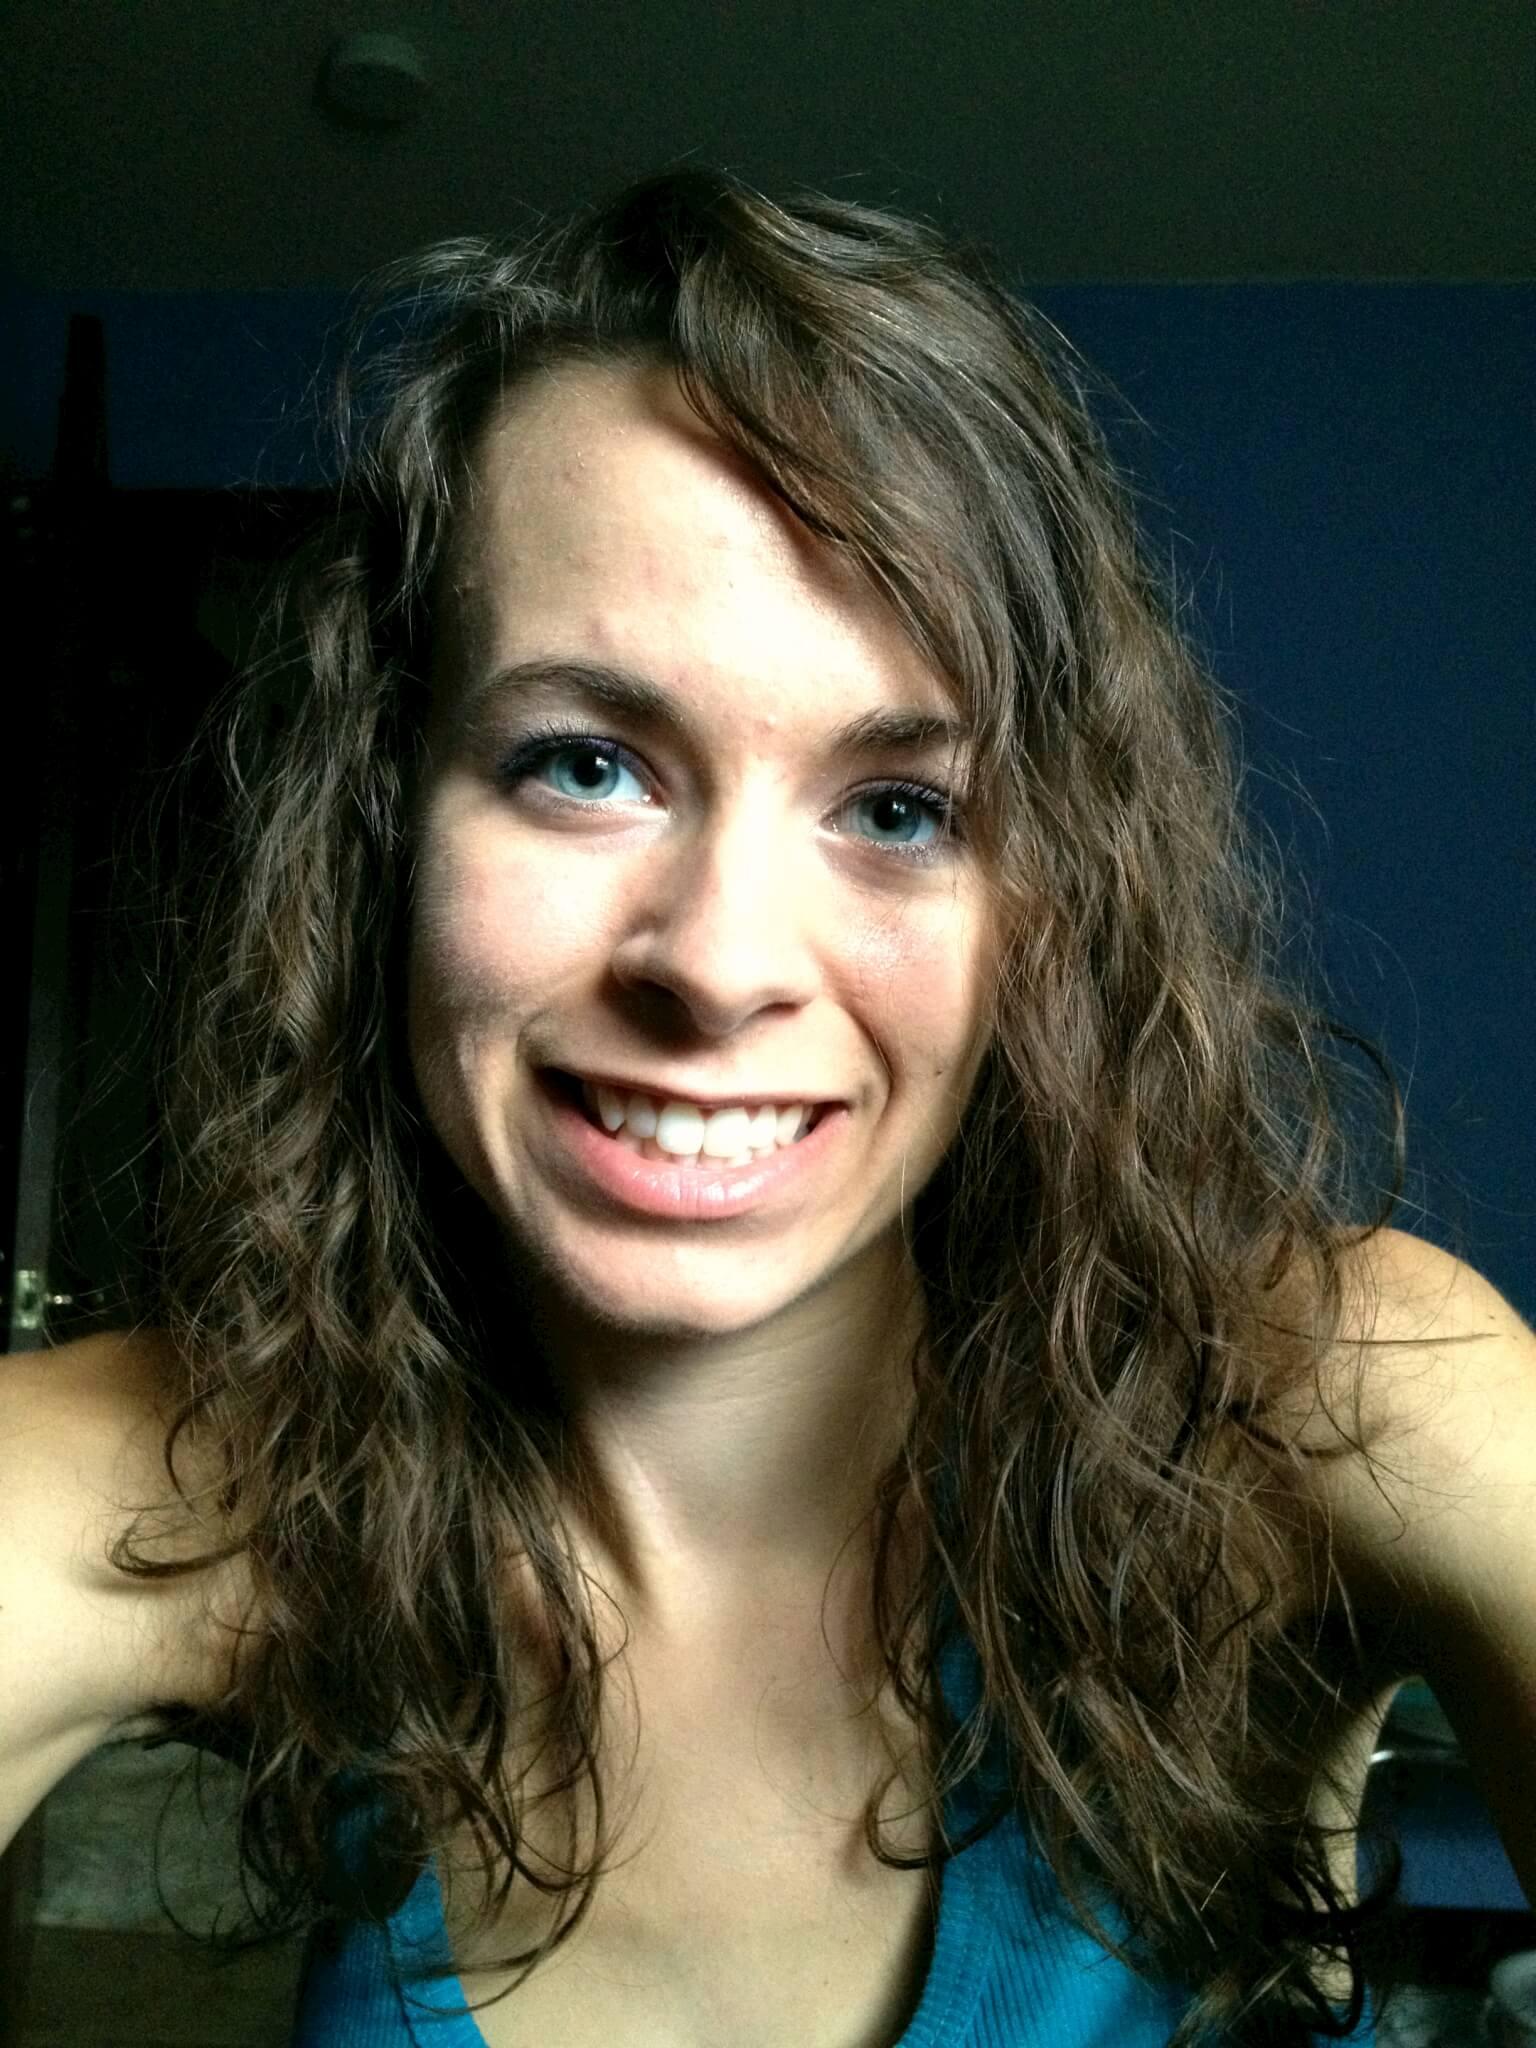 LizDunnIntroduction2 - Introducing Contributor Liz Dunn, Future Registered Dietitian